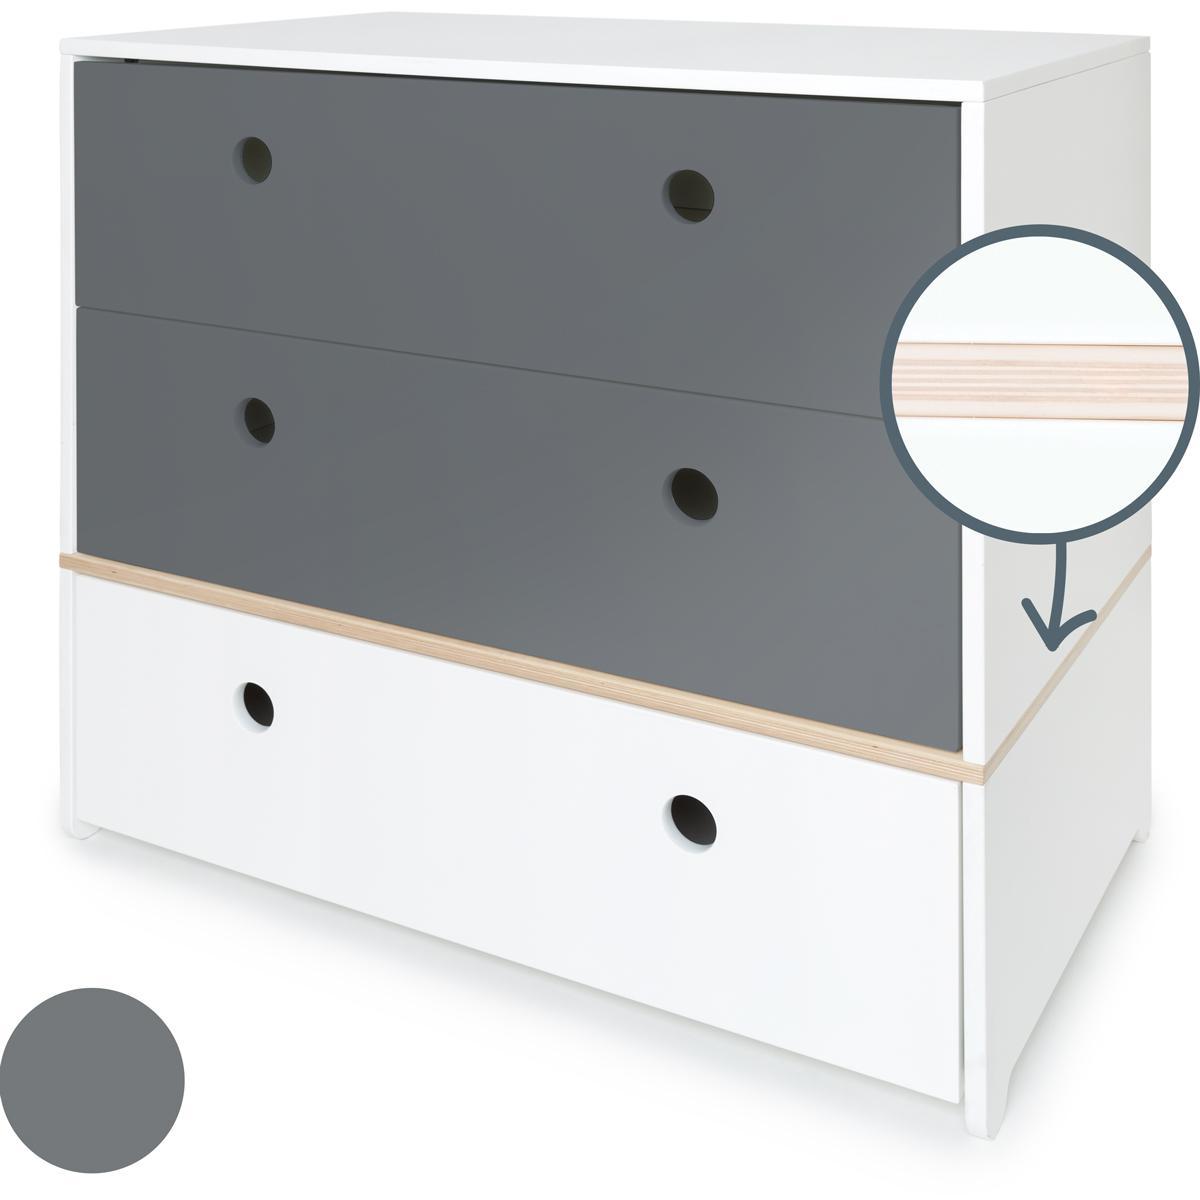 Kommode COLORFLEX Schubladen Farben space grey-space grey-white